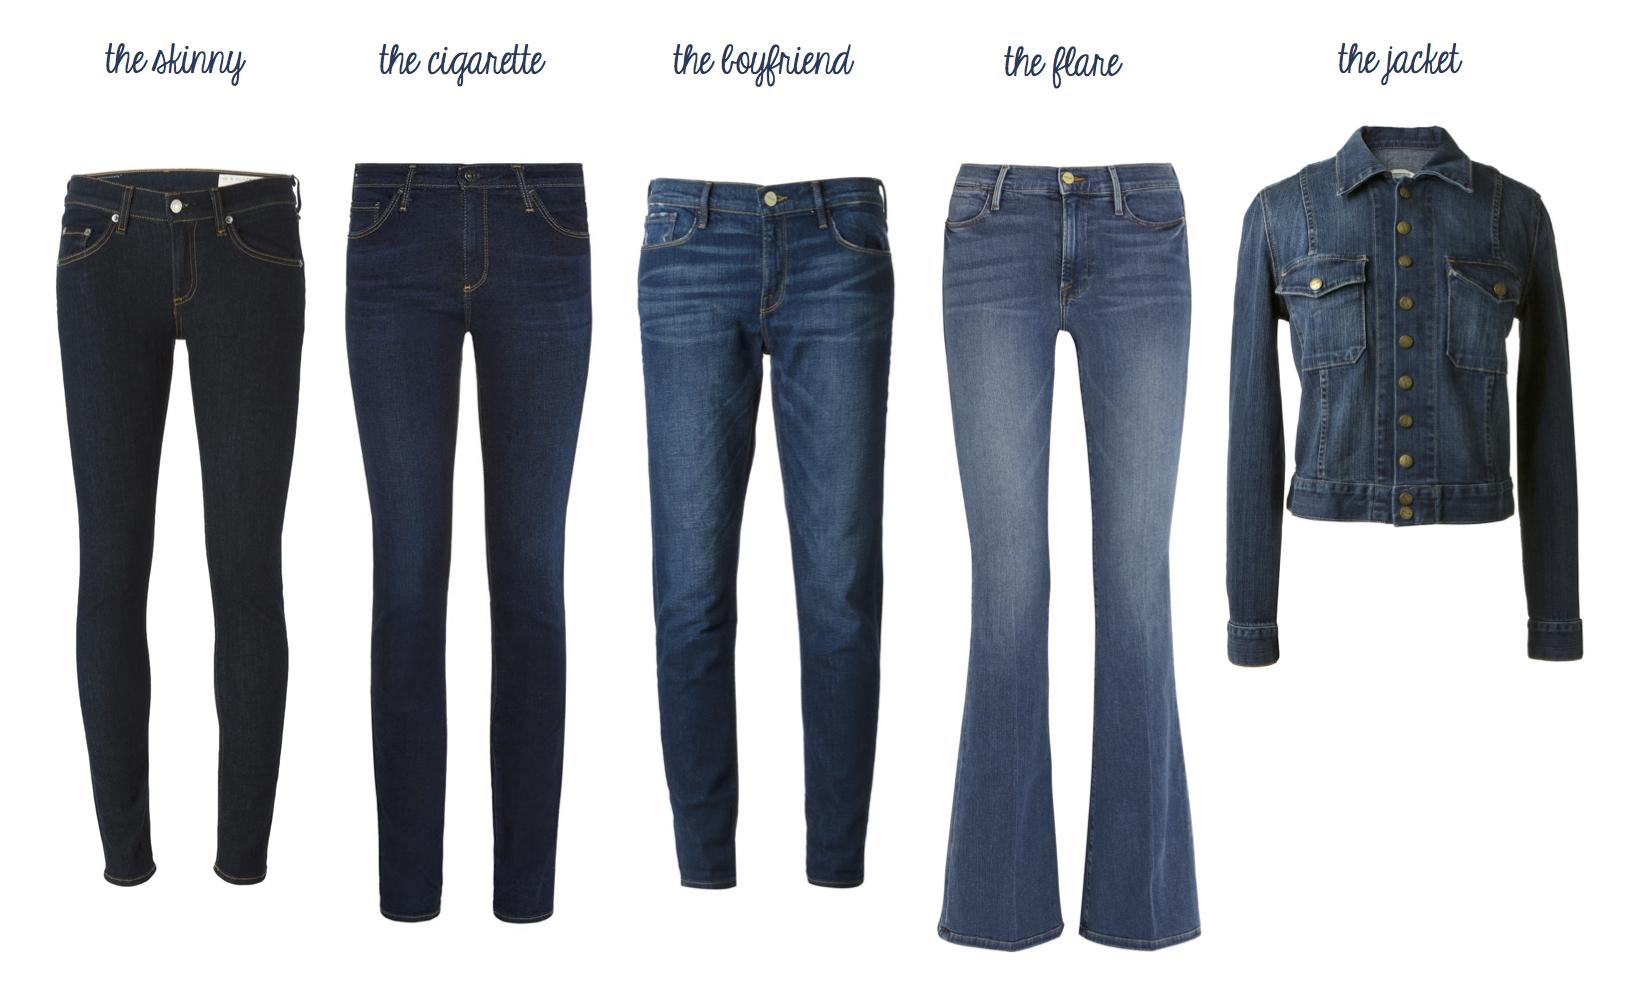 "Rag & Bone Skinny Jean, AG Jeans Harper Straight Leg Jeans, Frame Le Garçon, Frame Le High Flare and Current/Elliott ""The Snap"" Jacket"